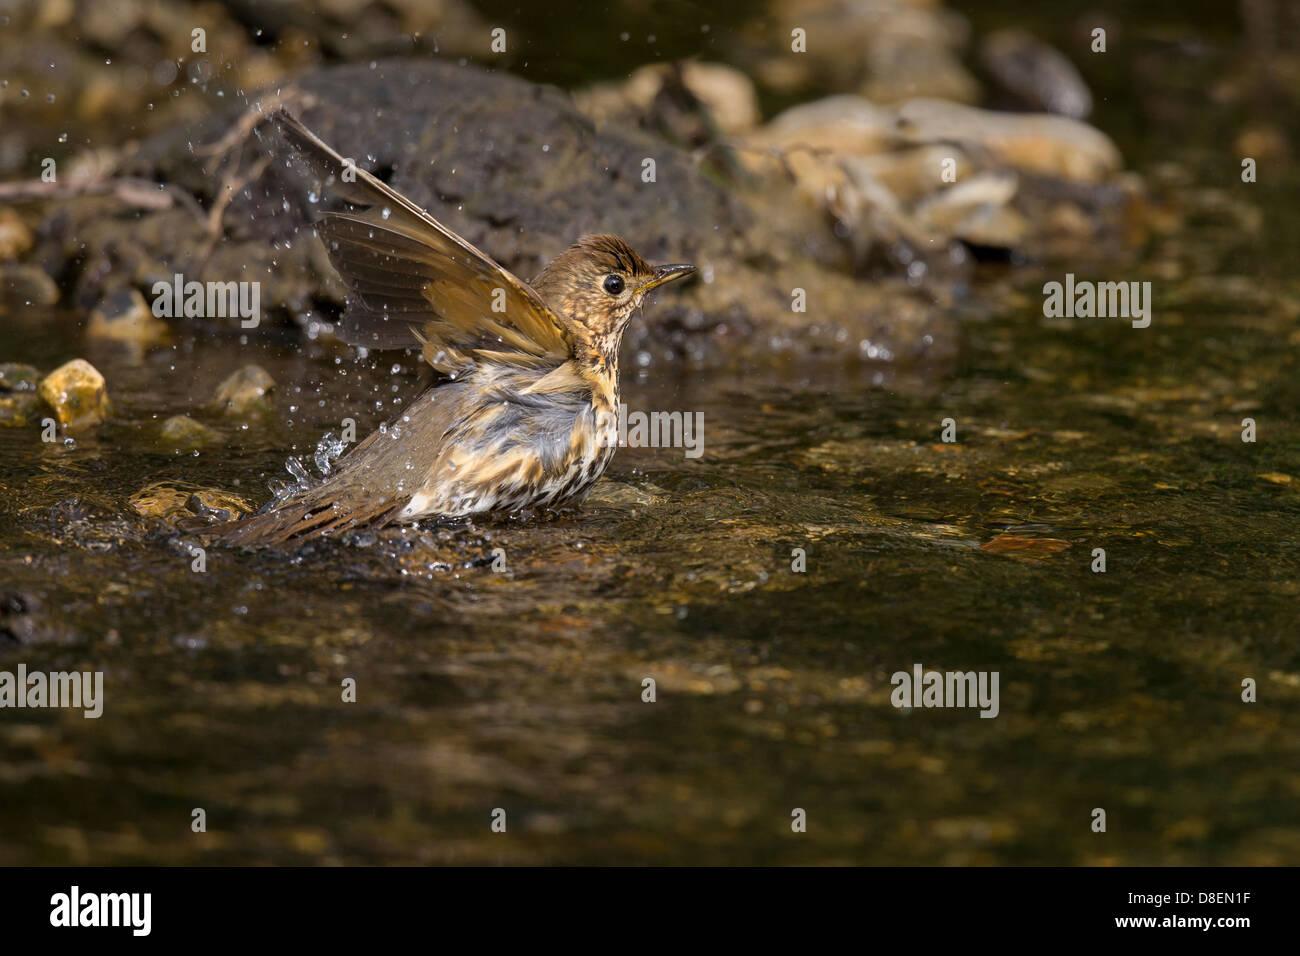 Song Thrush having a bath - Stock Image